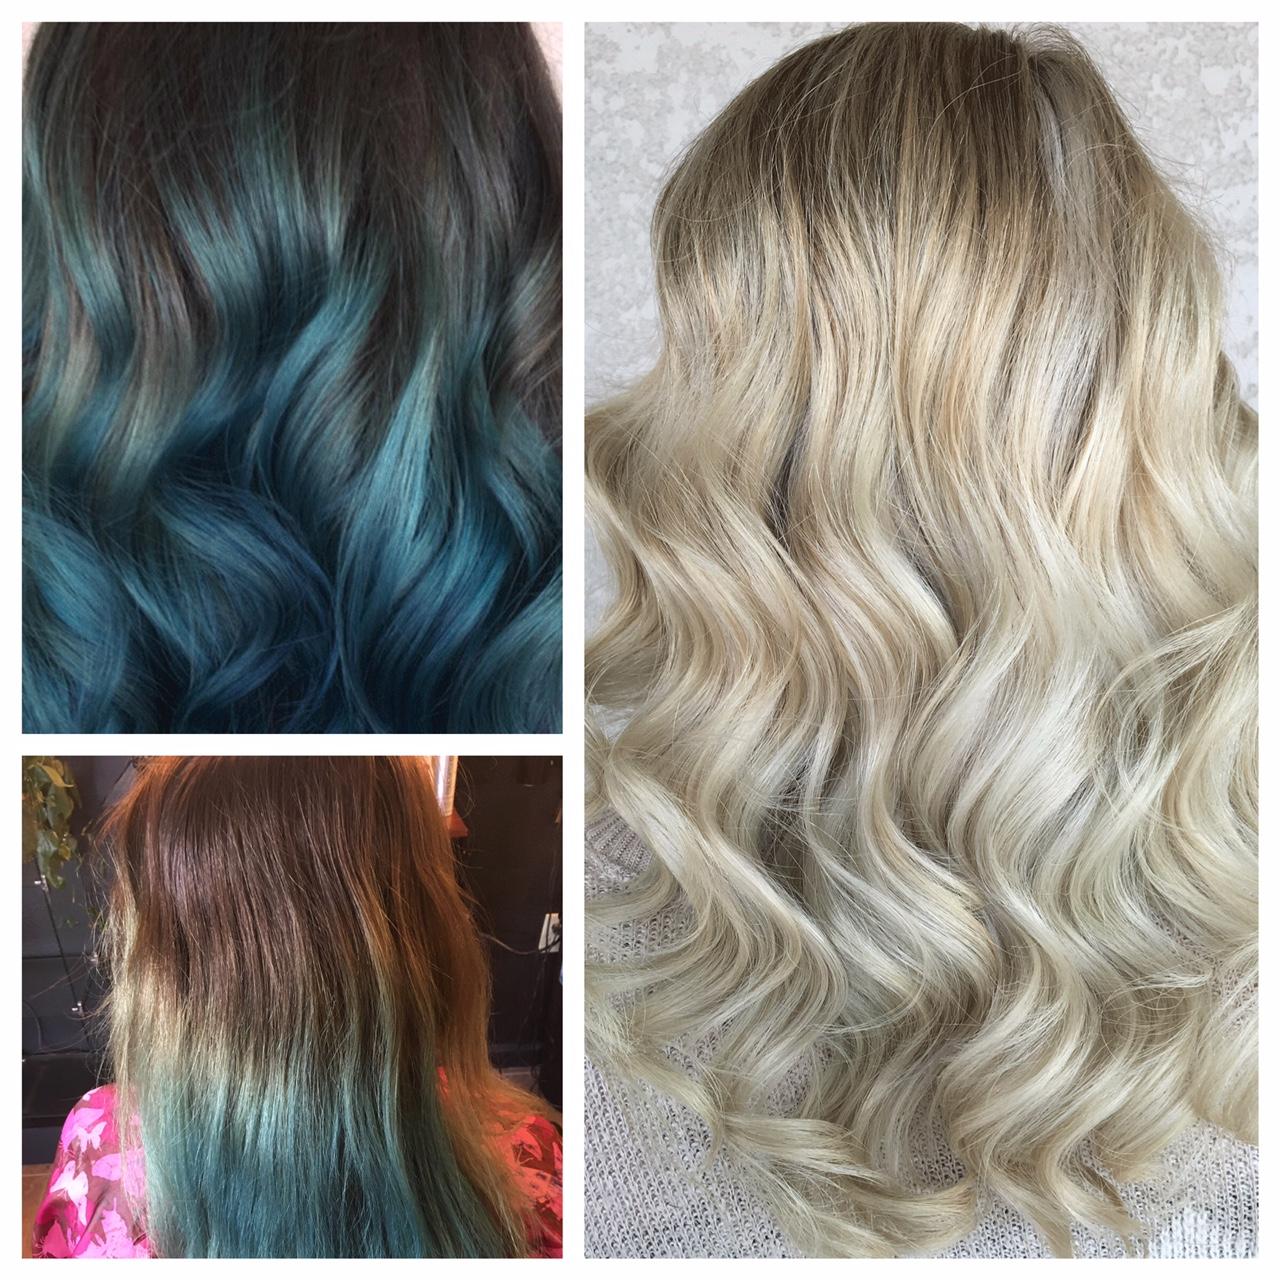 Vivid Blue to Bright Blonde Balayage Beauty